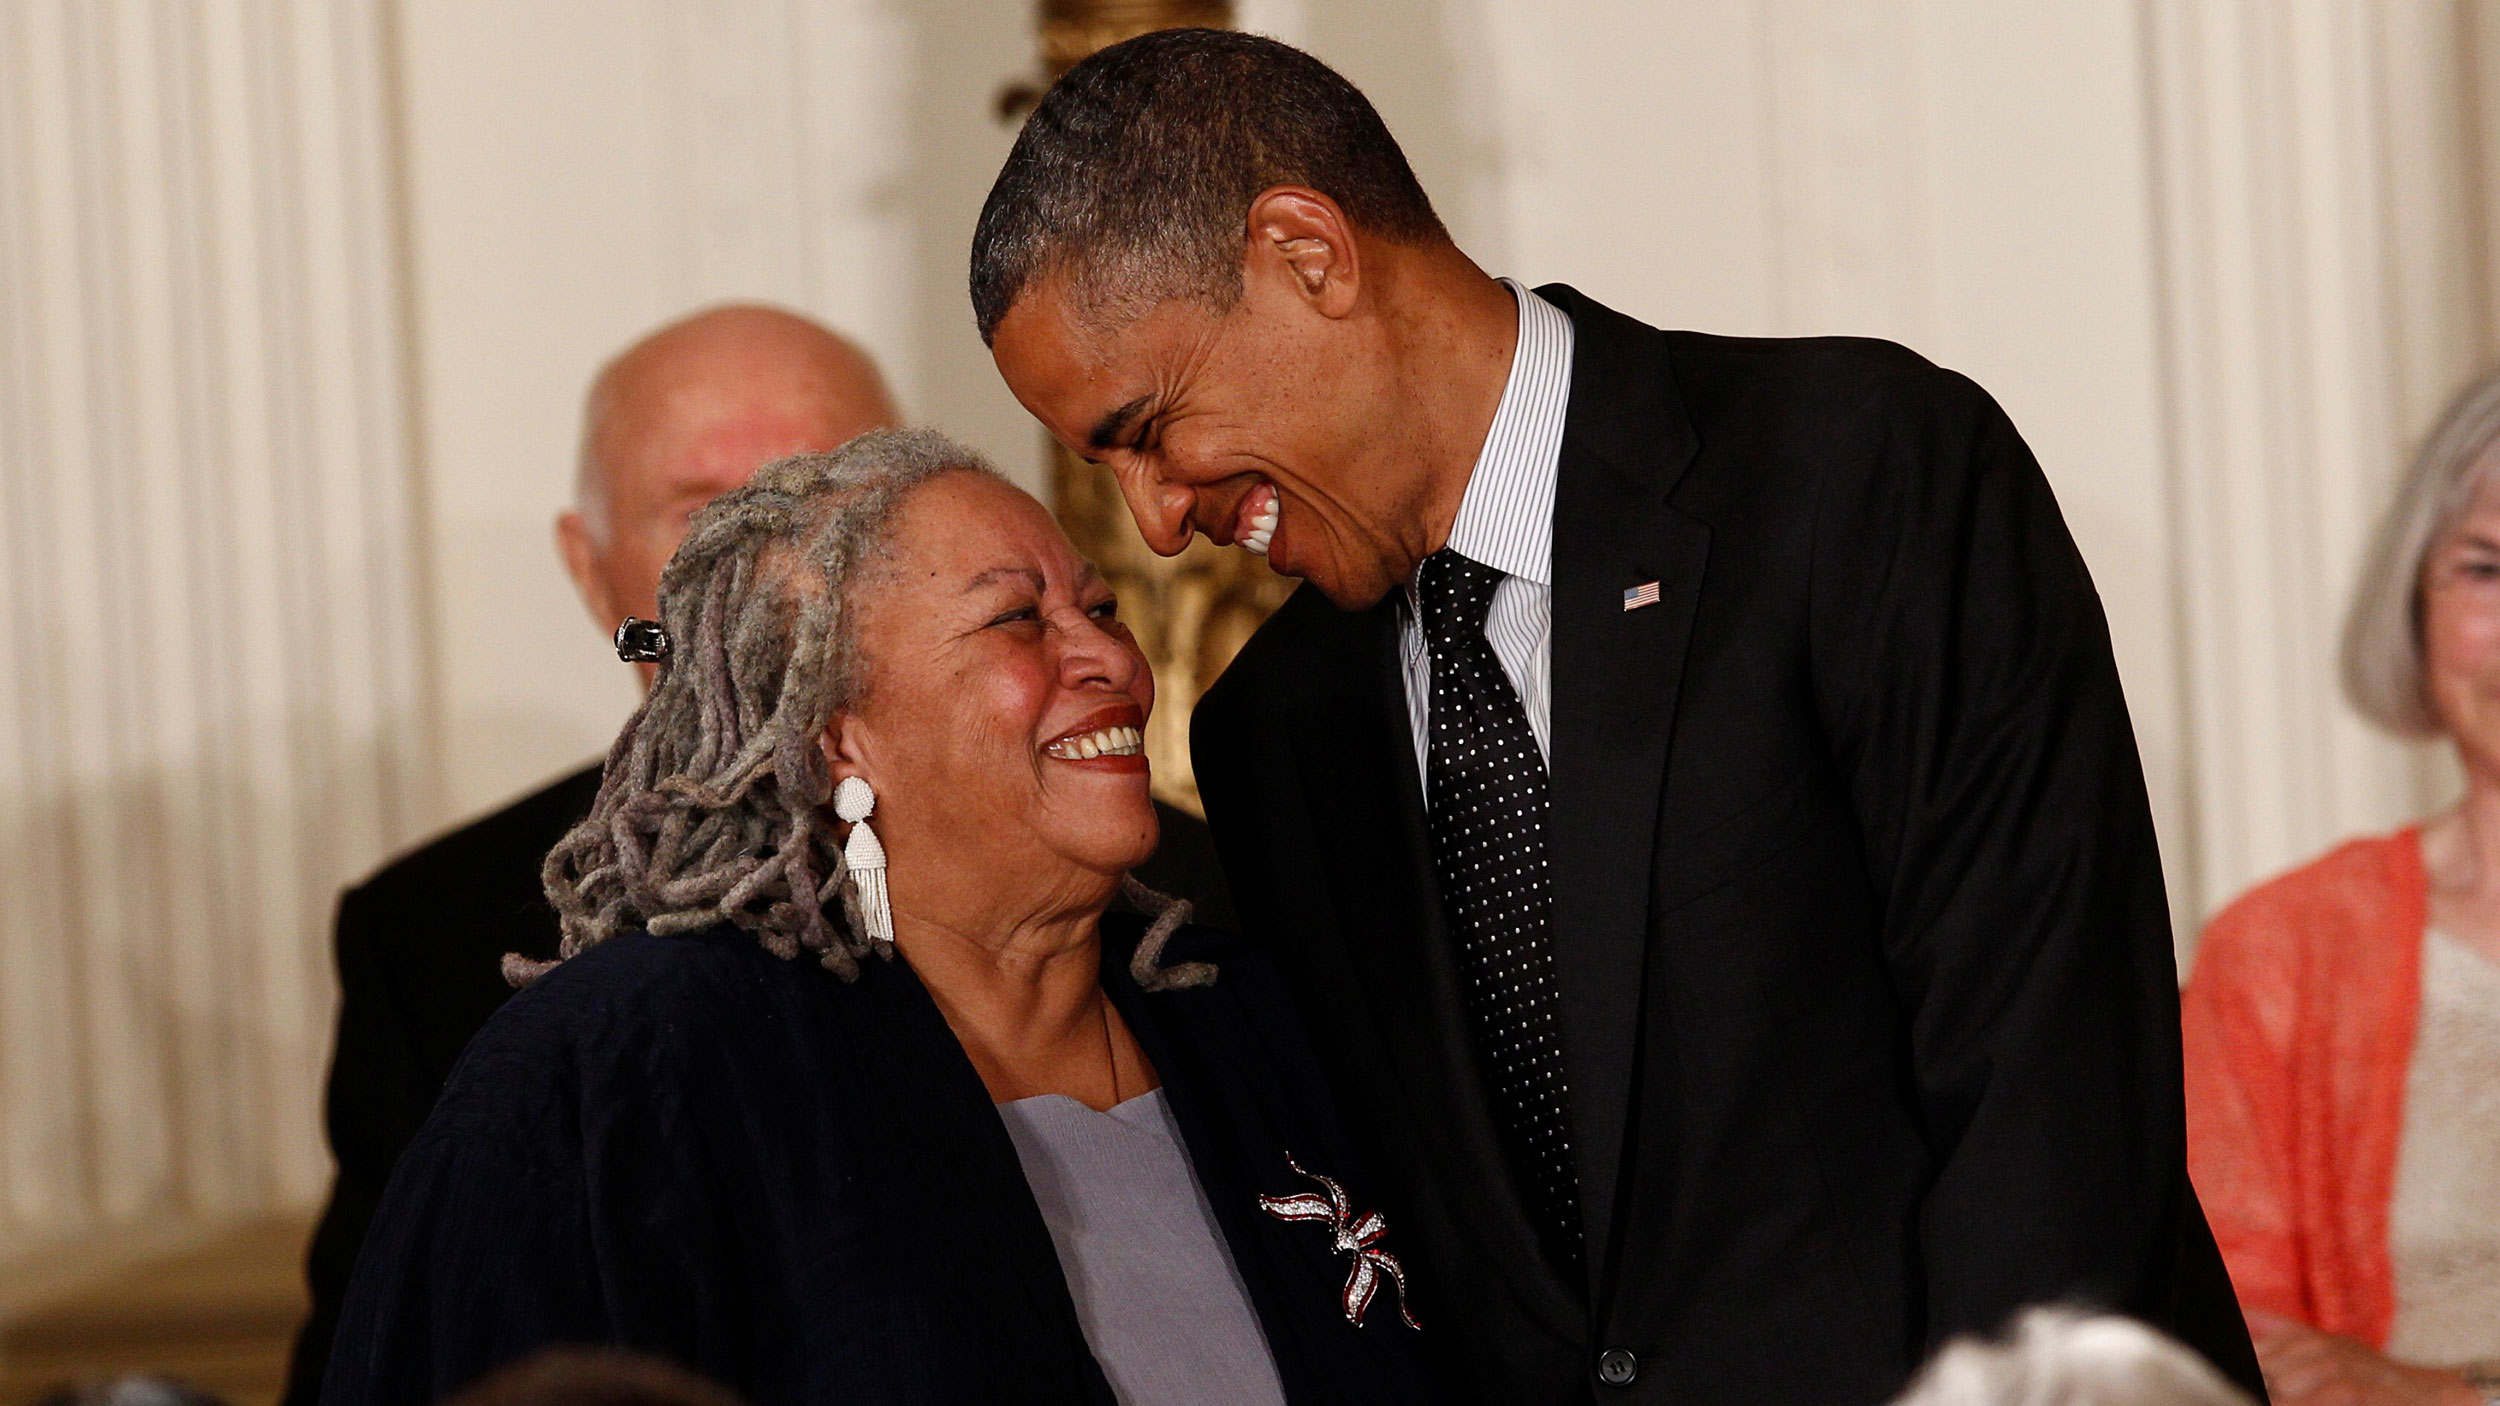 Writer Toni Morrison and Barack Obama smile at each other